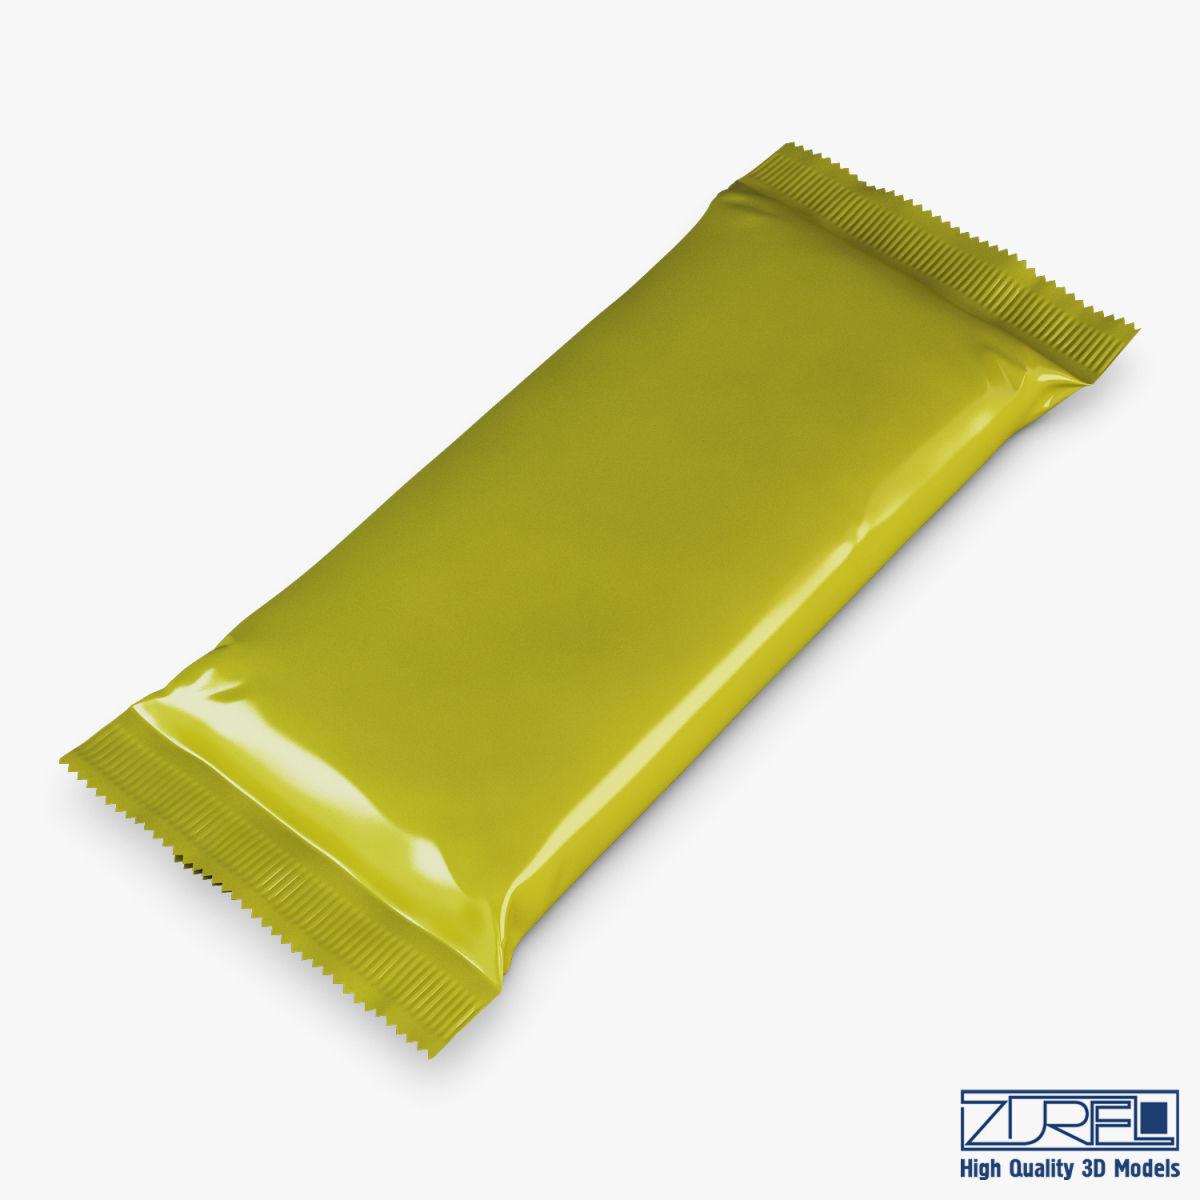 Candy wrapper v 9